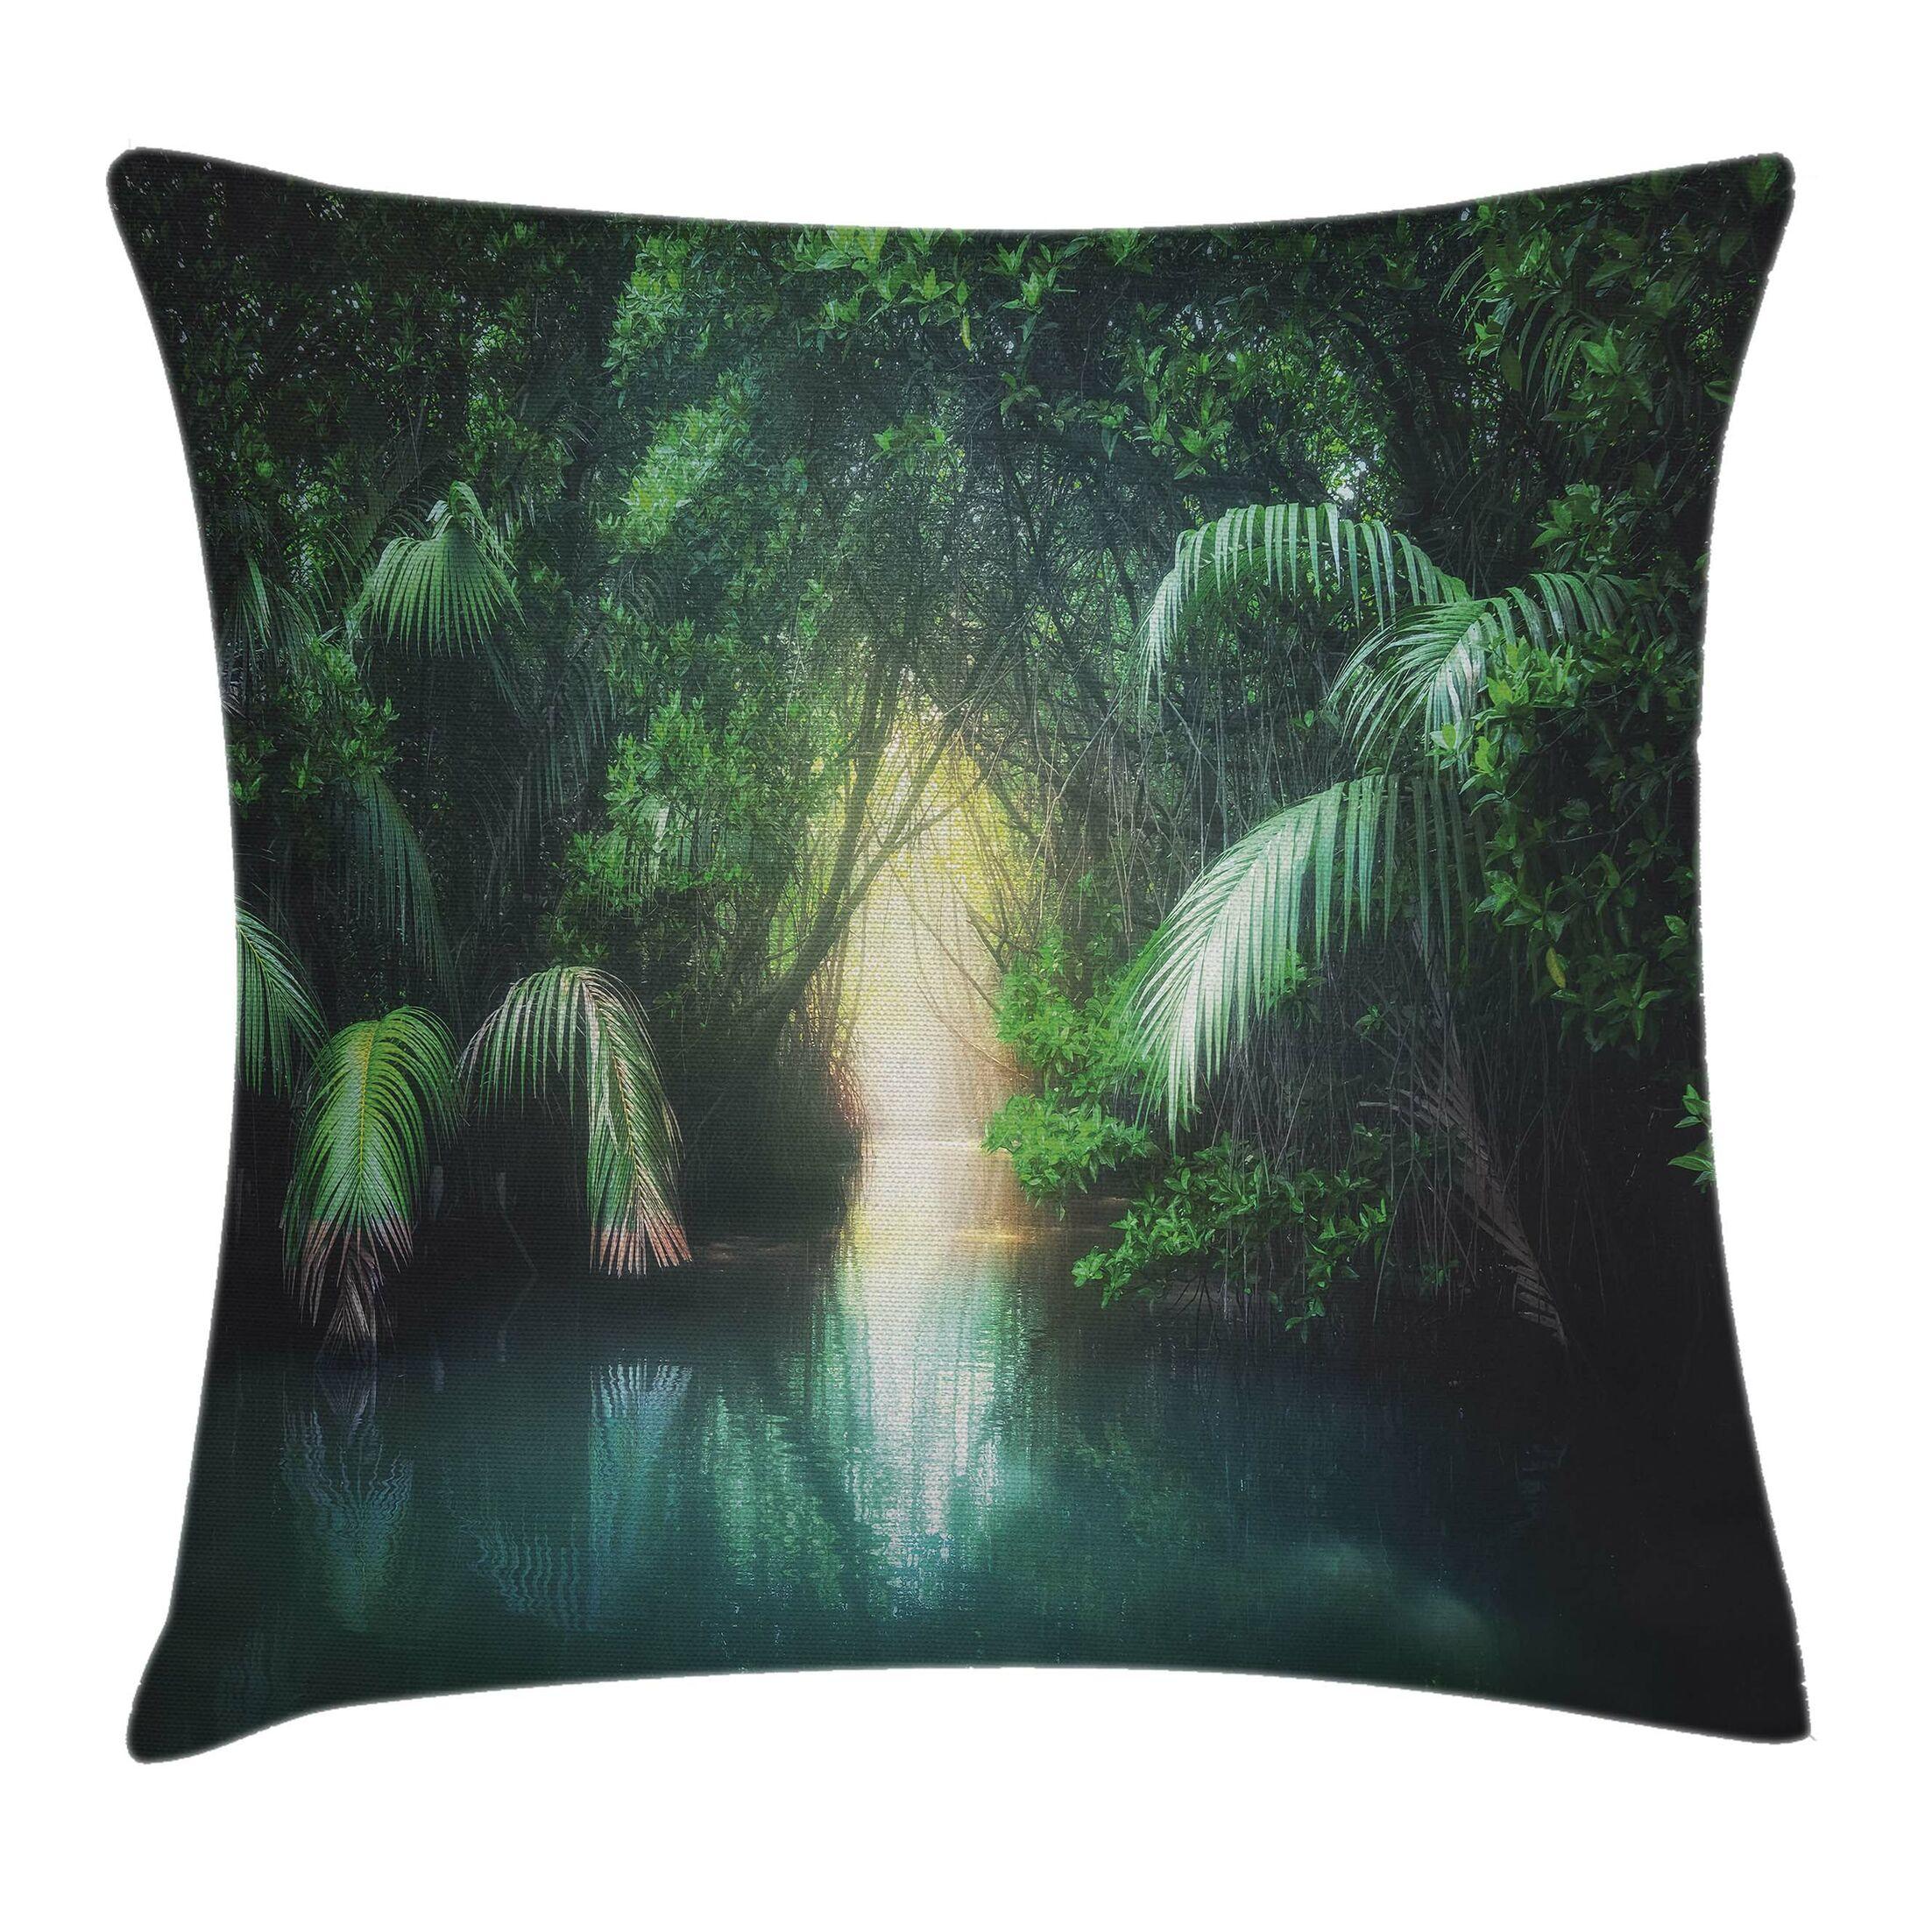 Jungle Mangrove Rainforest Lake Pillow Cover Size: 24